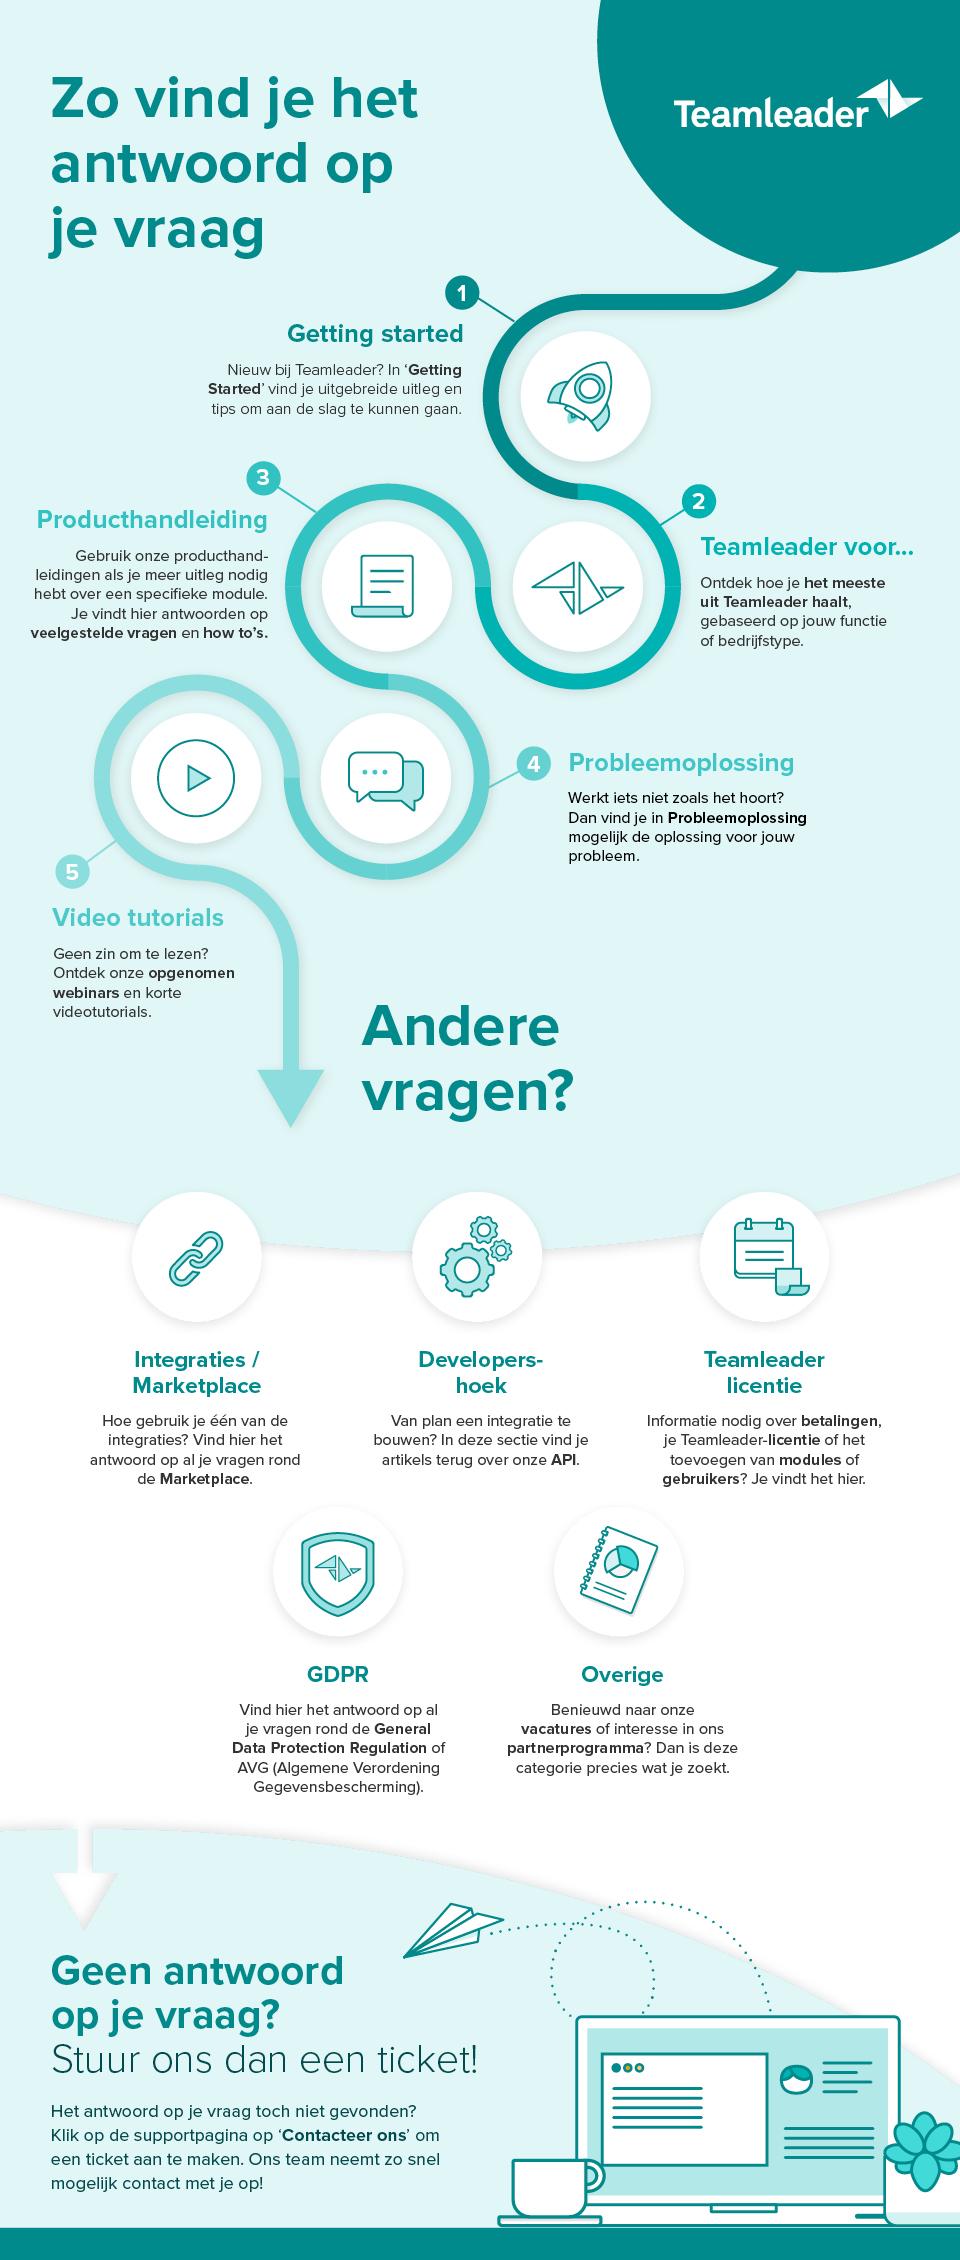 HQ_Blog_TeamleaderSupportSystem_NL_BE